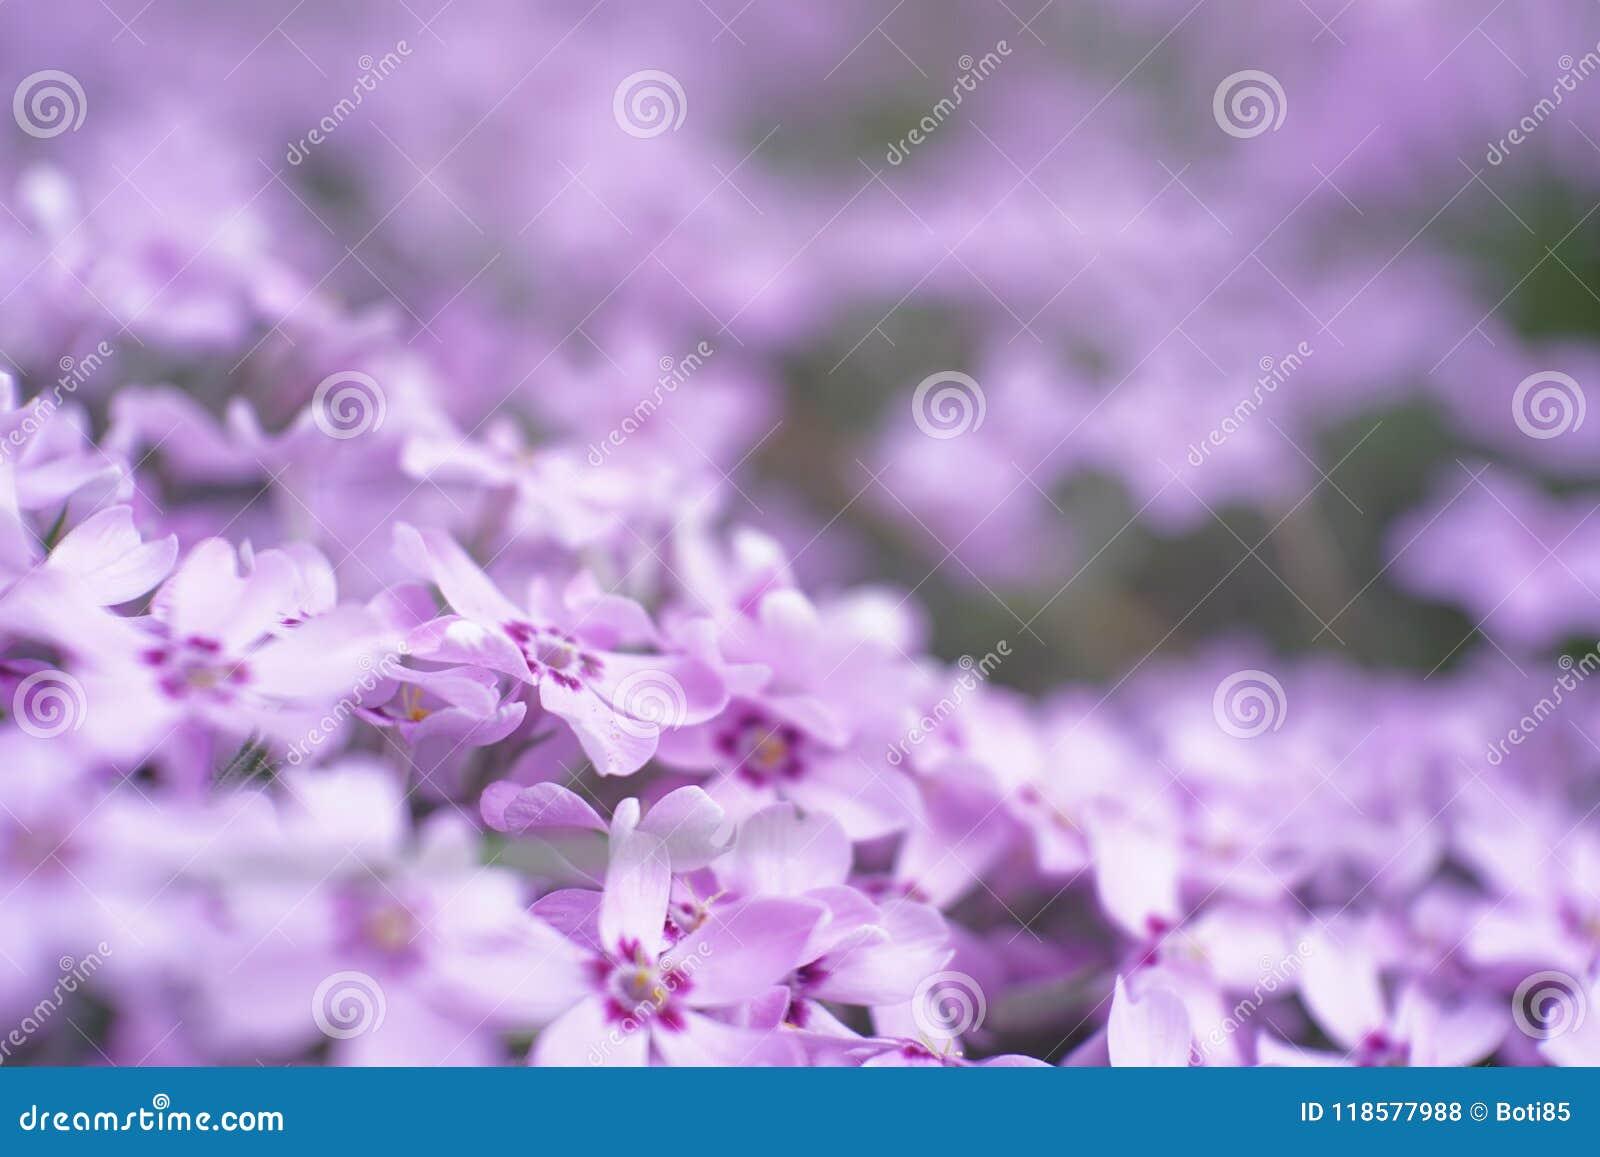 Small Garden Filled With Light Purple Flower Macro World Stock Photo